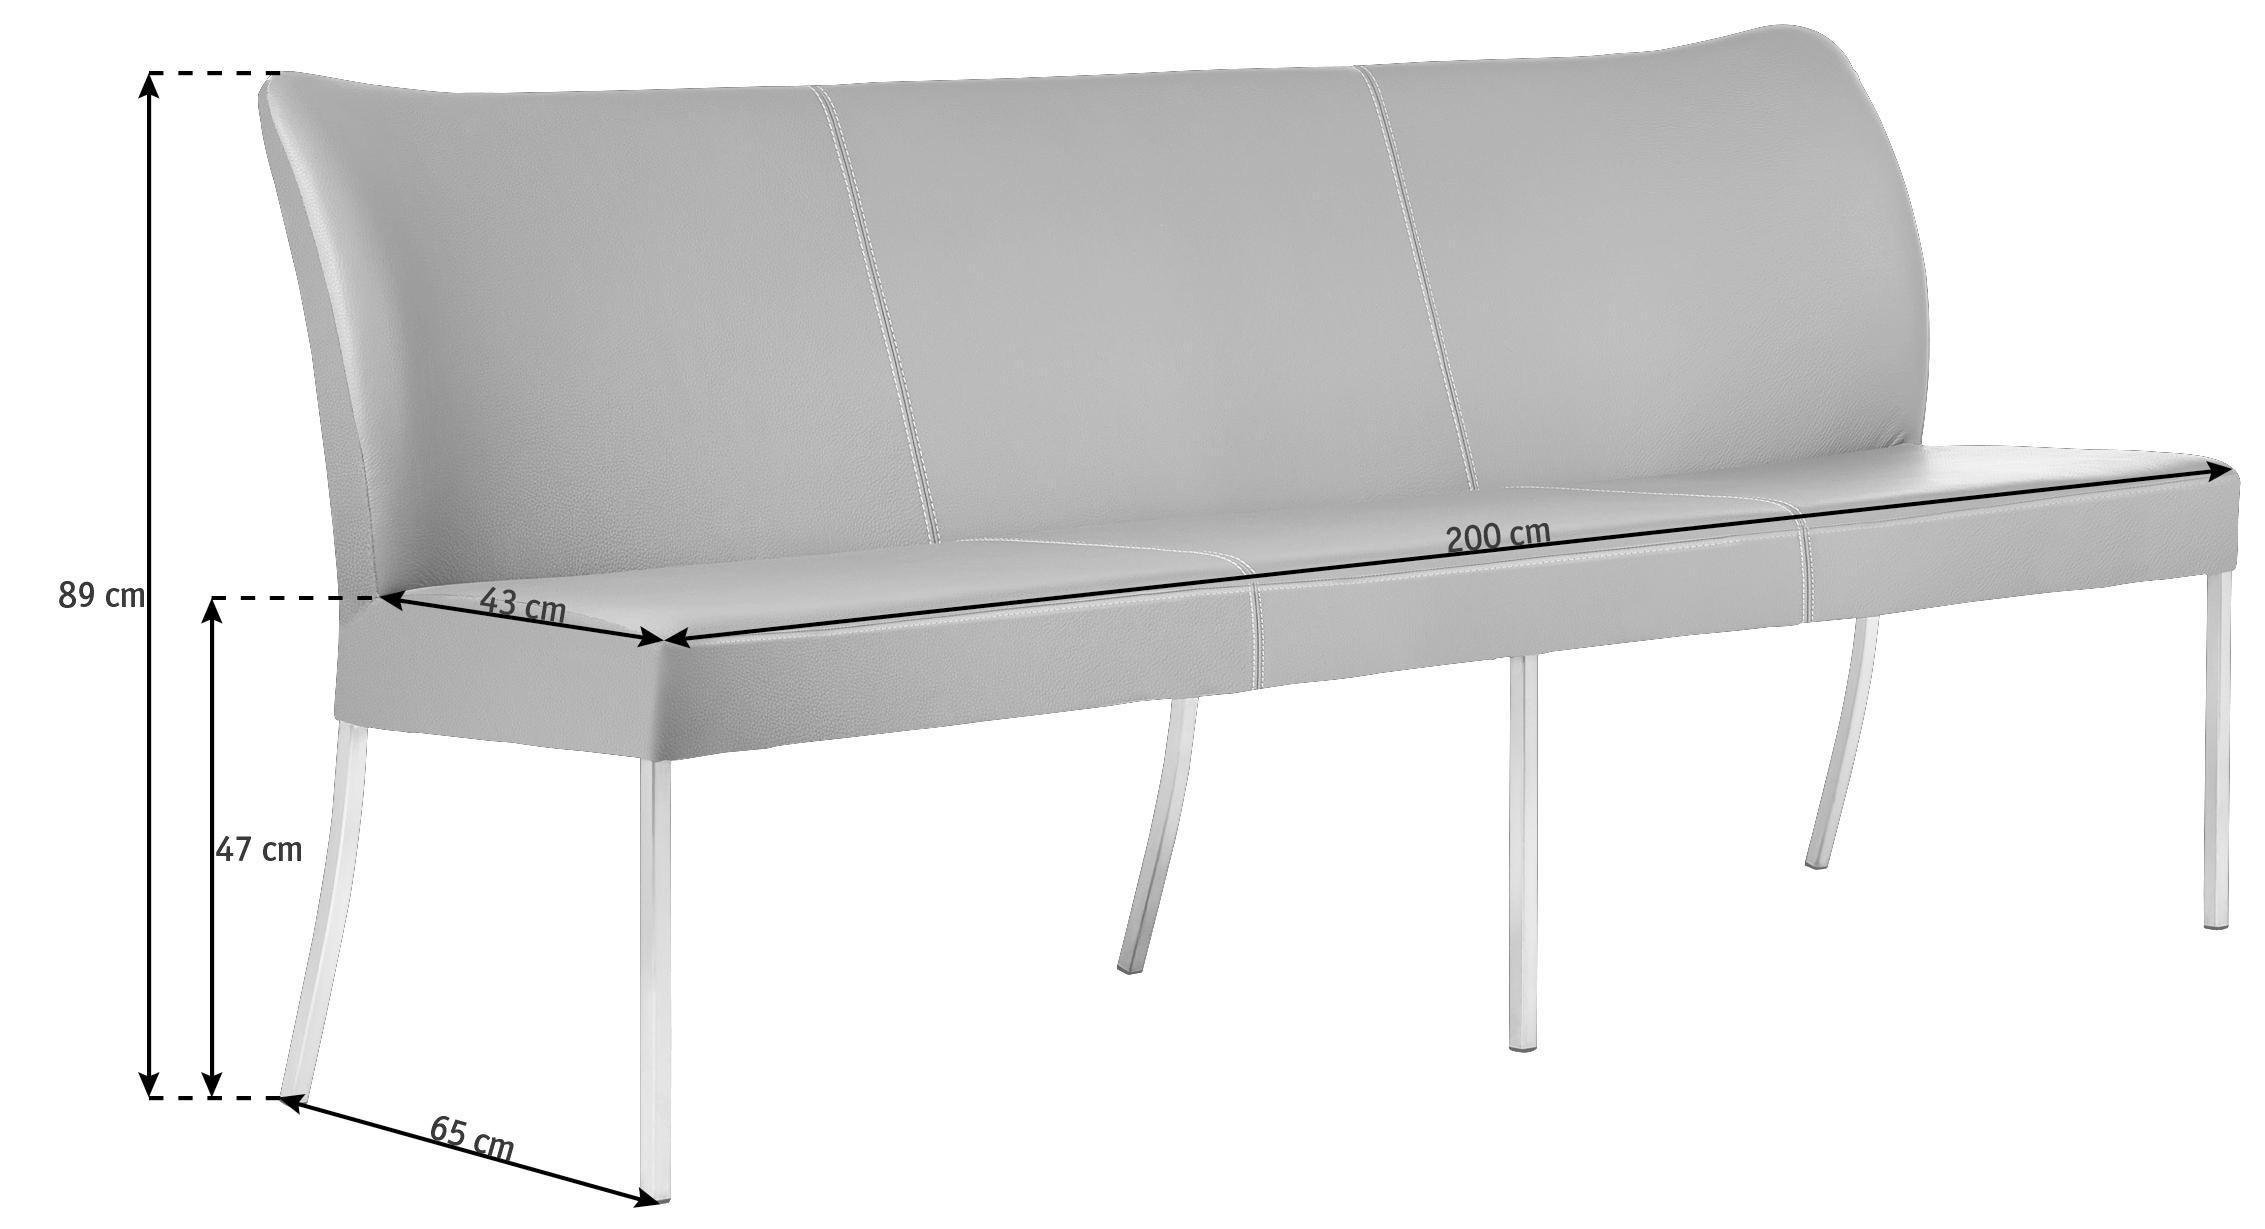 SITZBANK Echtleder Edelstahlfarben, Grün - Edelstahlfarben/Grün, Design, Leder/Metall (200cm) - BERT PLANTAGIE